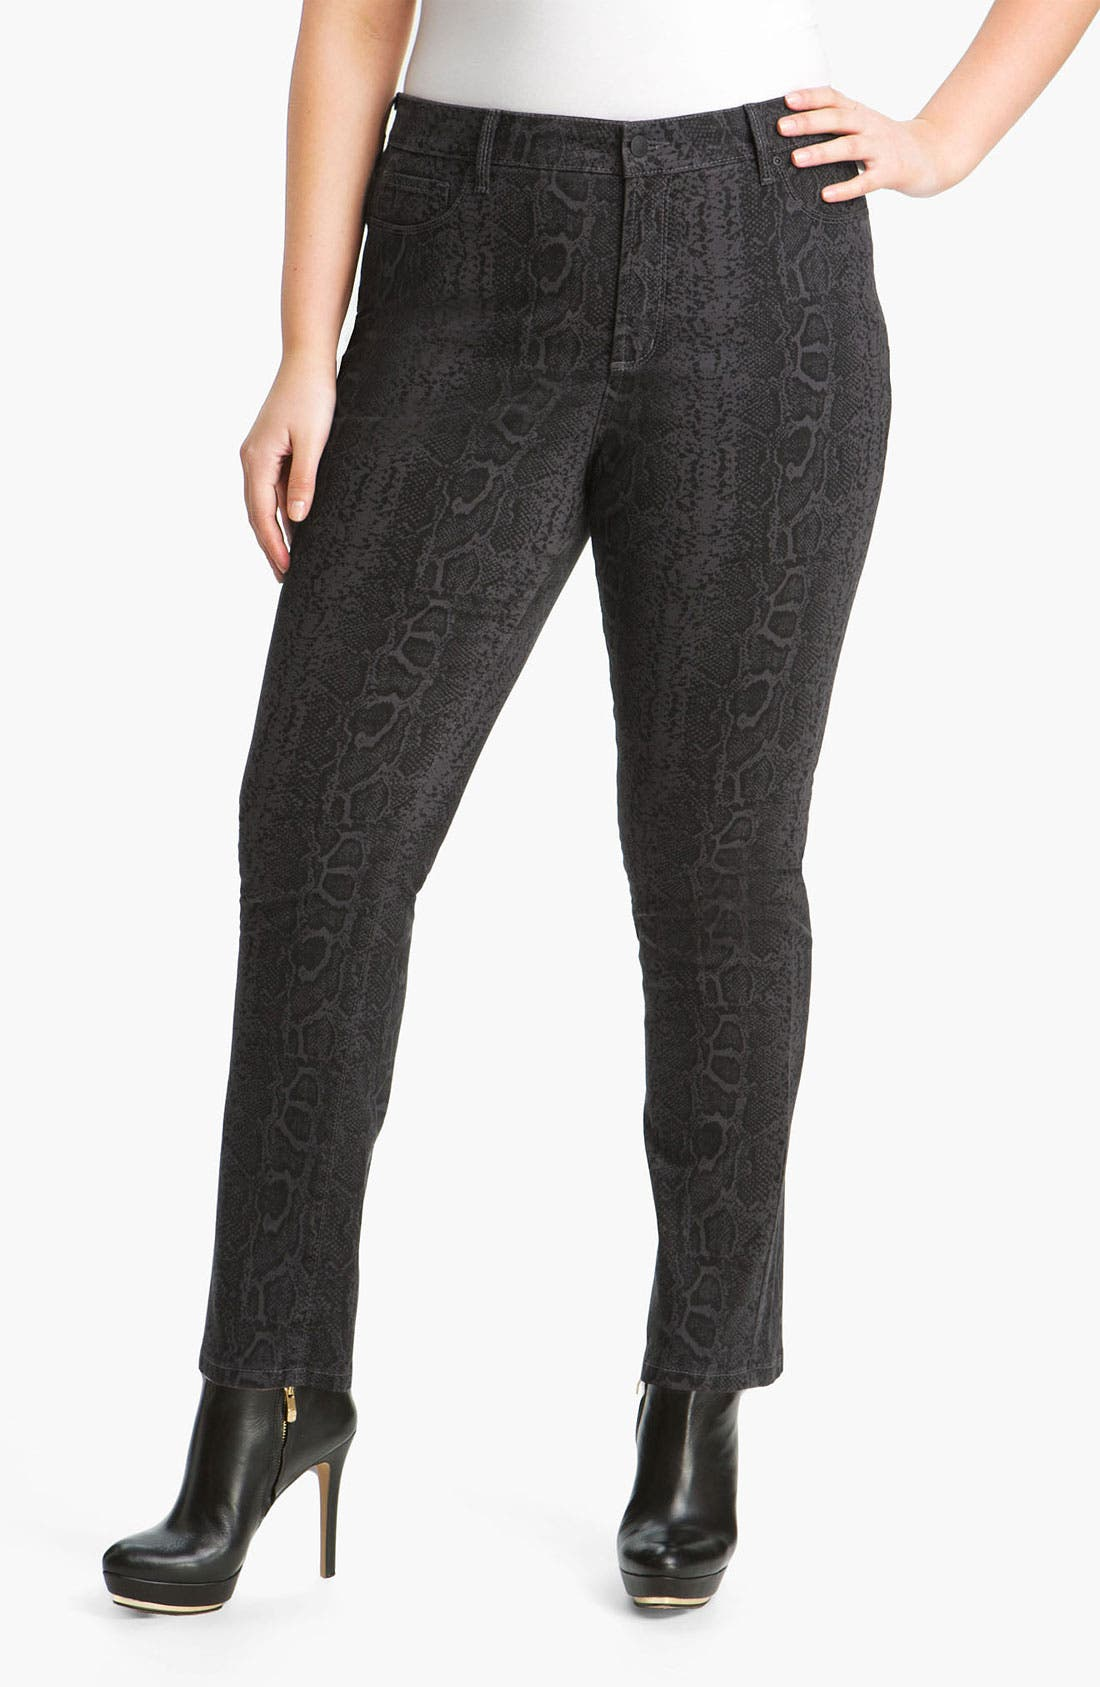 Main Image - NYDJ 'Sheri' Python Print Skinny Twill Jeans (Plus)